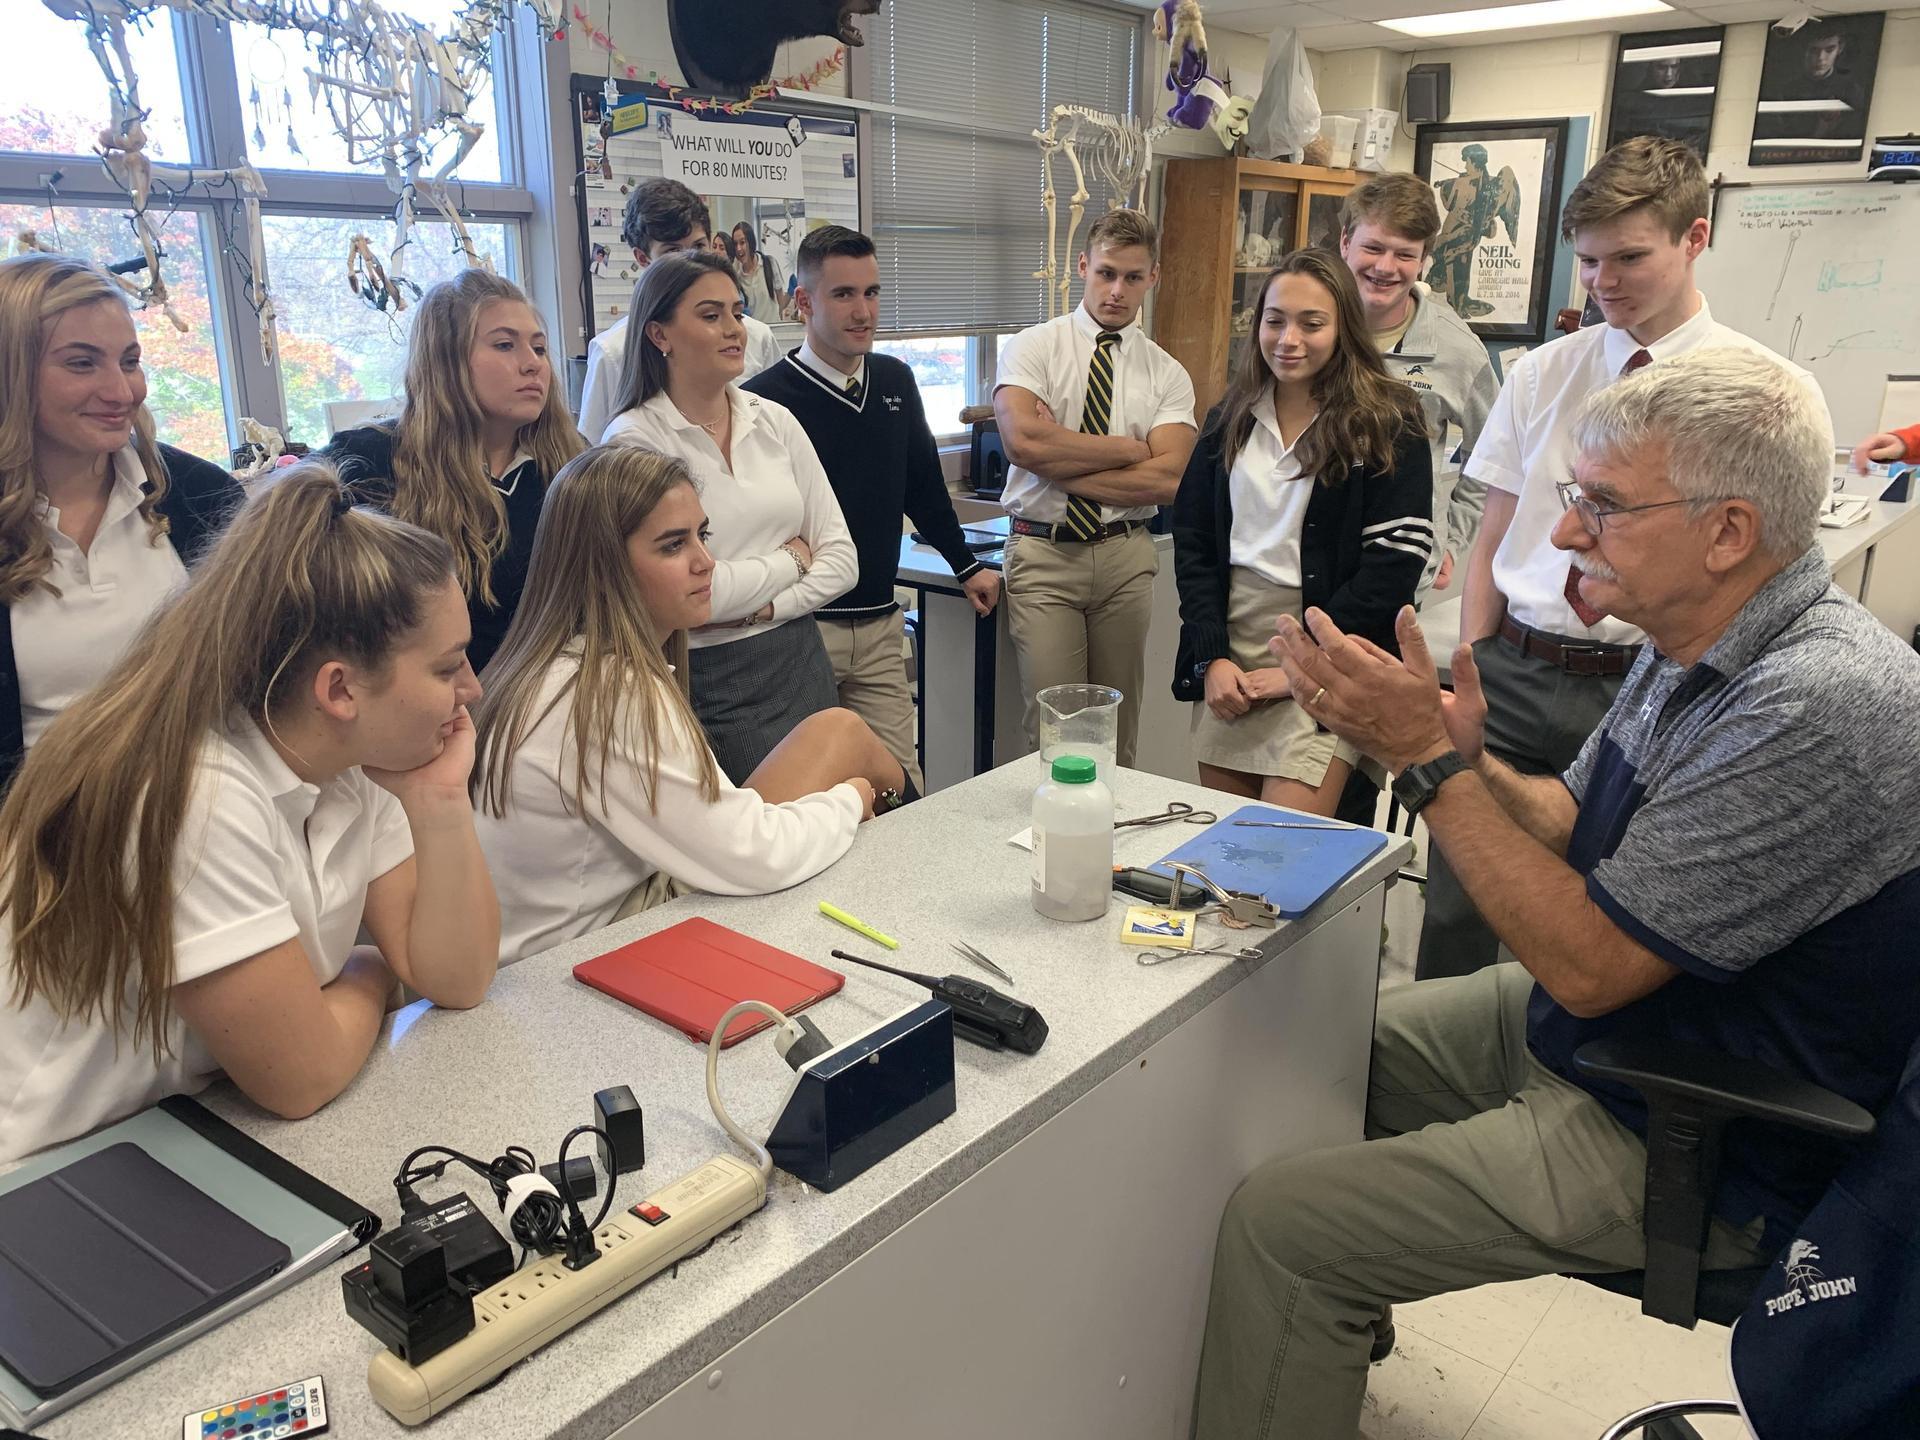 PJ Science 2